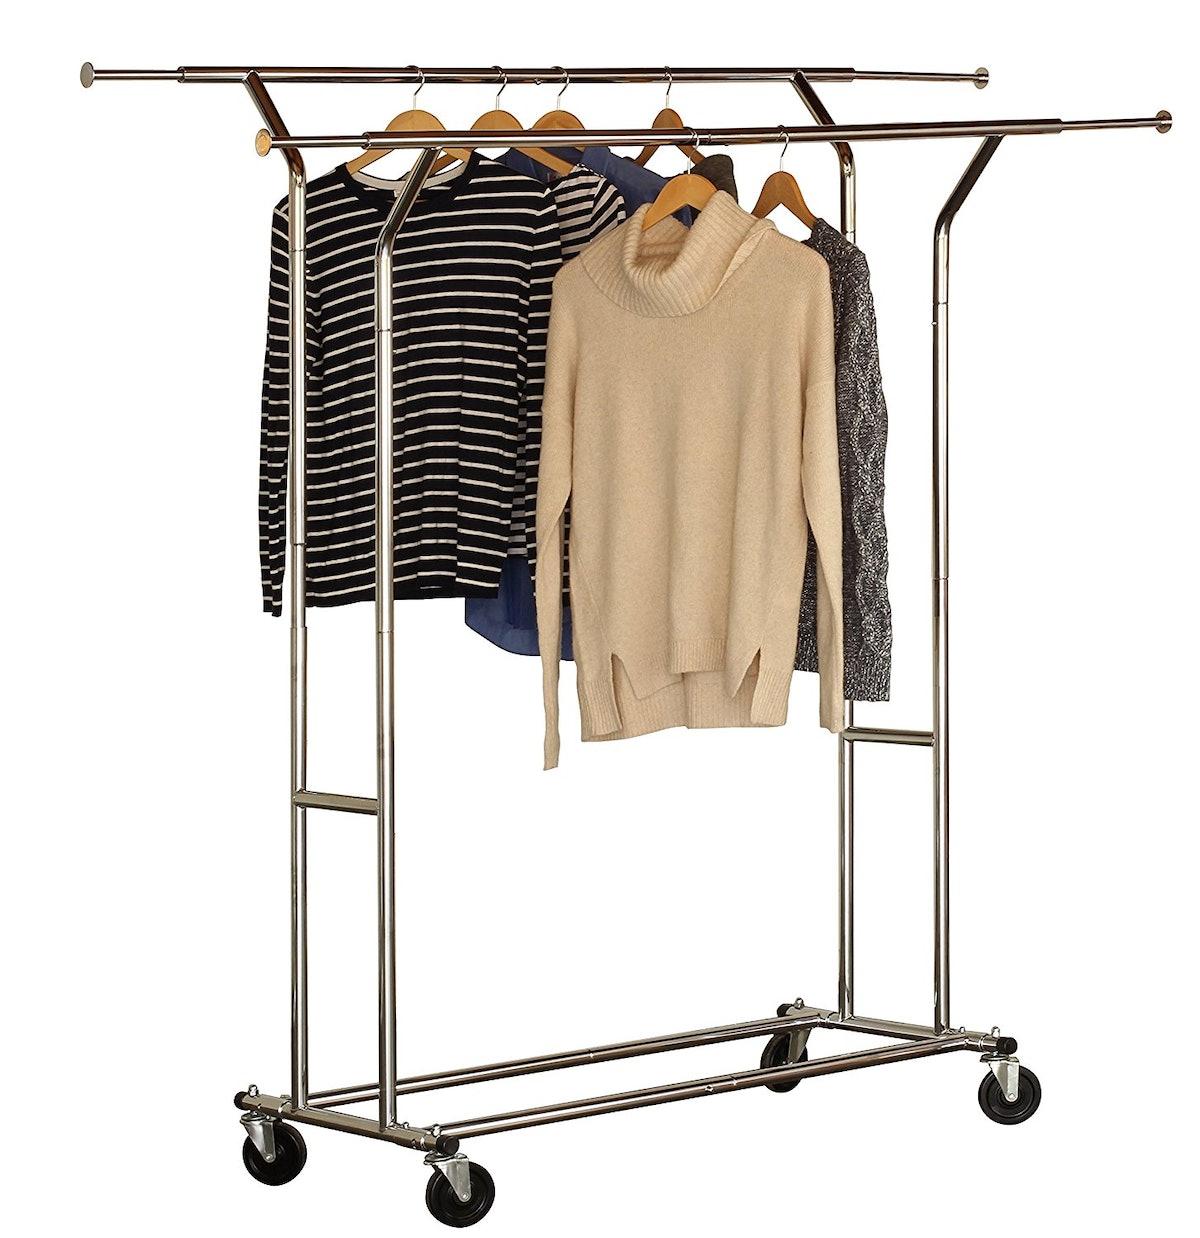 DecoBros Double Rail Garment Rack